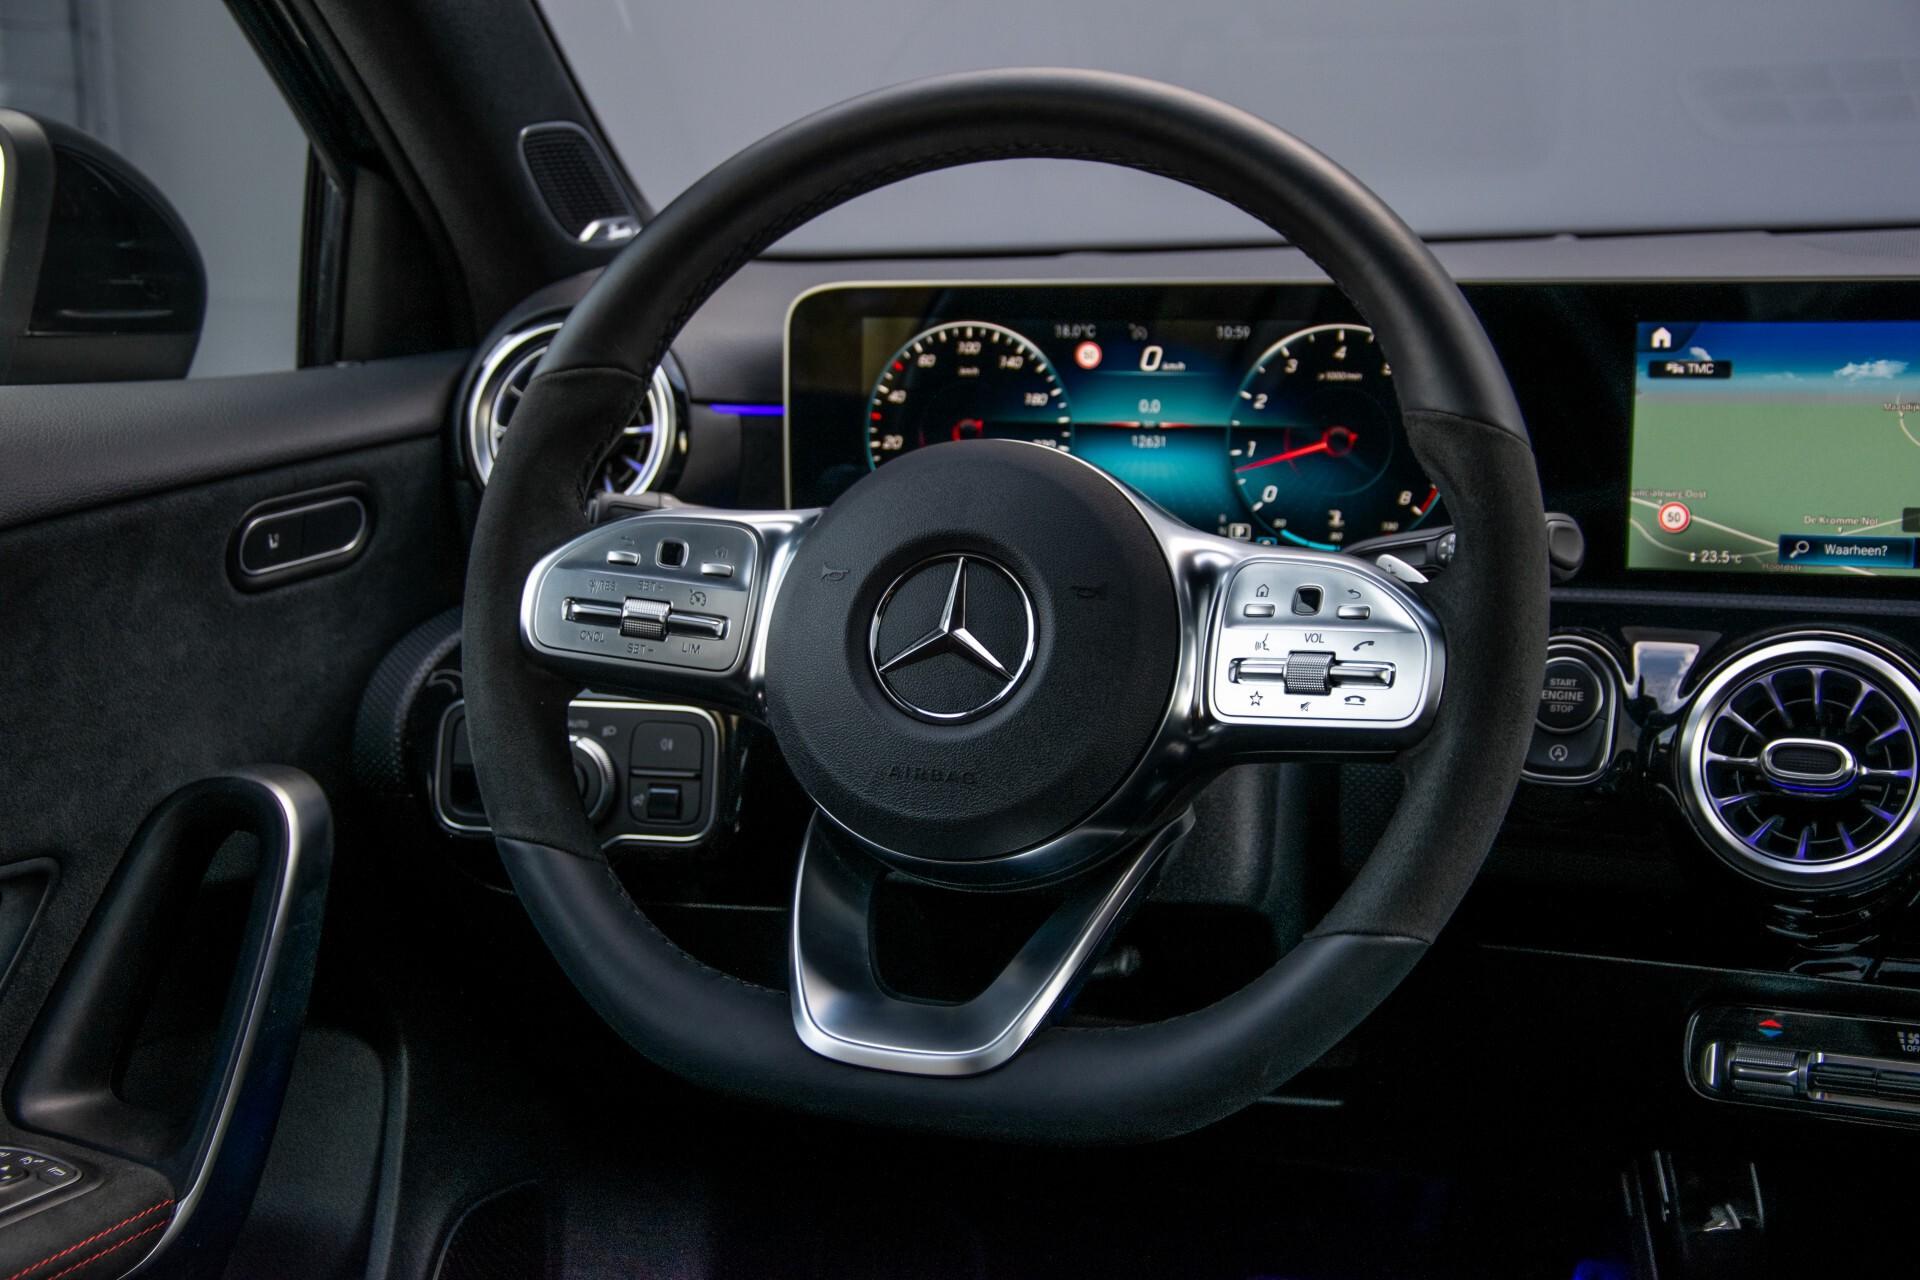 Mercedes-Benz A-Klasse 250 4-M AMG Panorama/Keyless-Entry/MBUX/HUD/Burmester/360/Multibeam LED Aut7 Foto 9